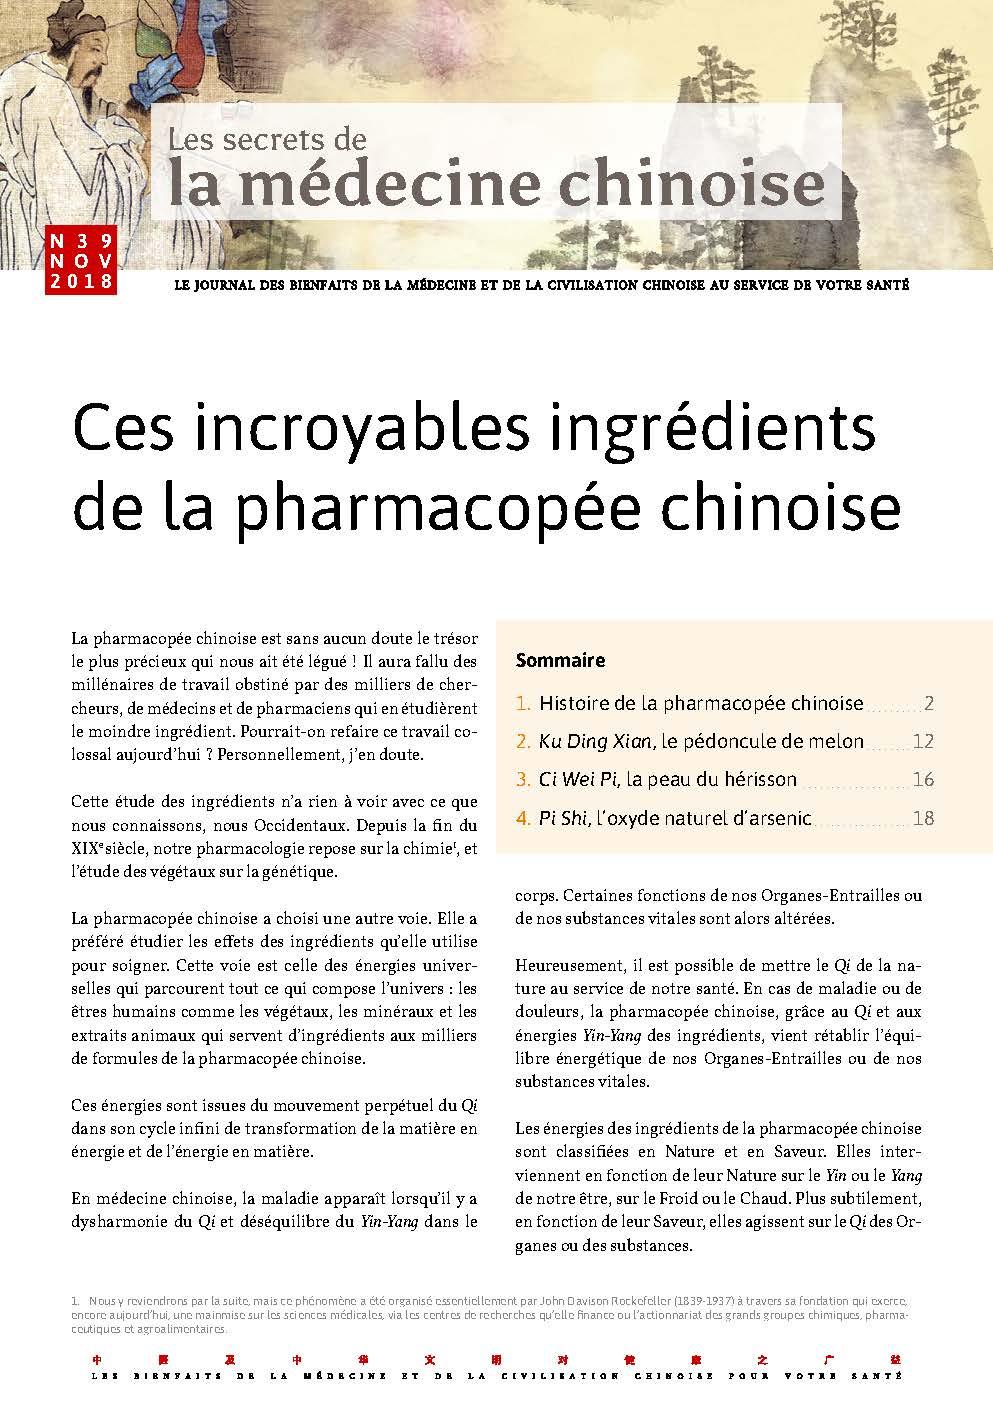 39-Novembre-2018-Ces-incroyables-ingredients-de-la-pharmacopee-chinoise-SD